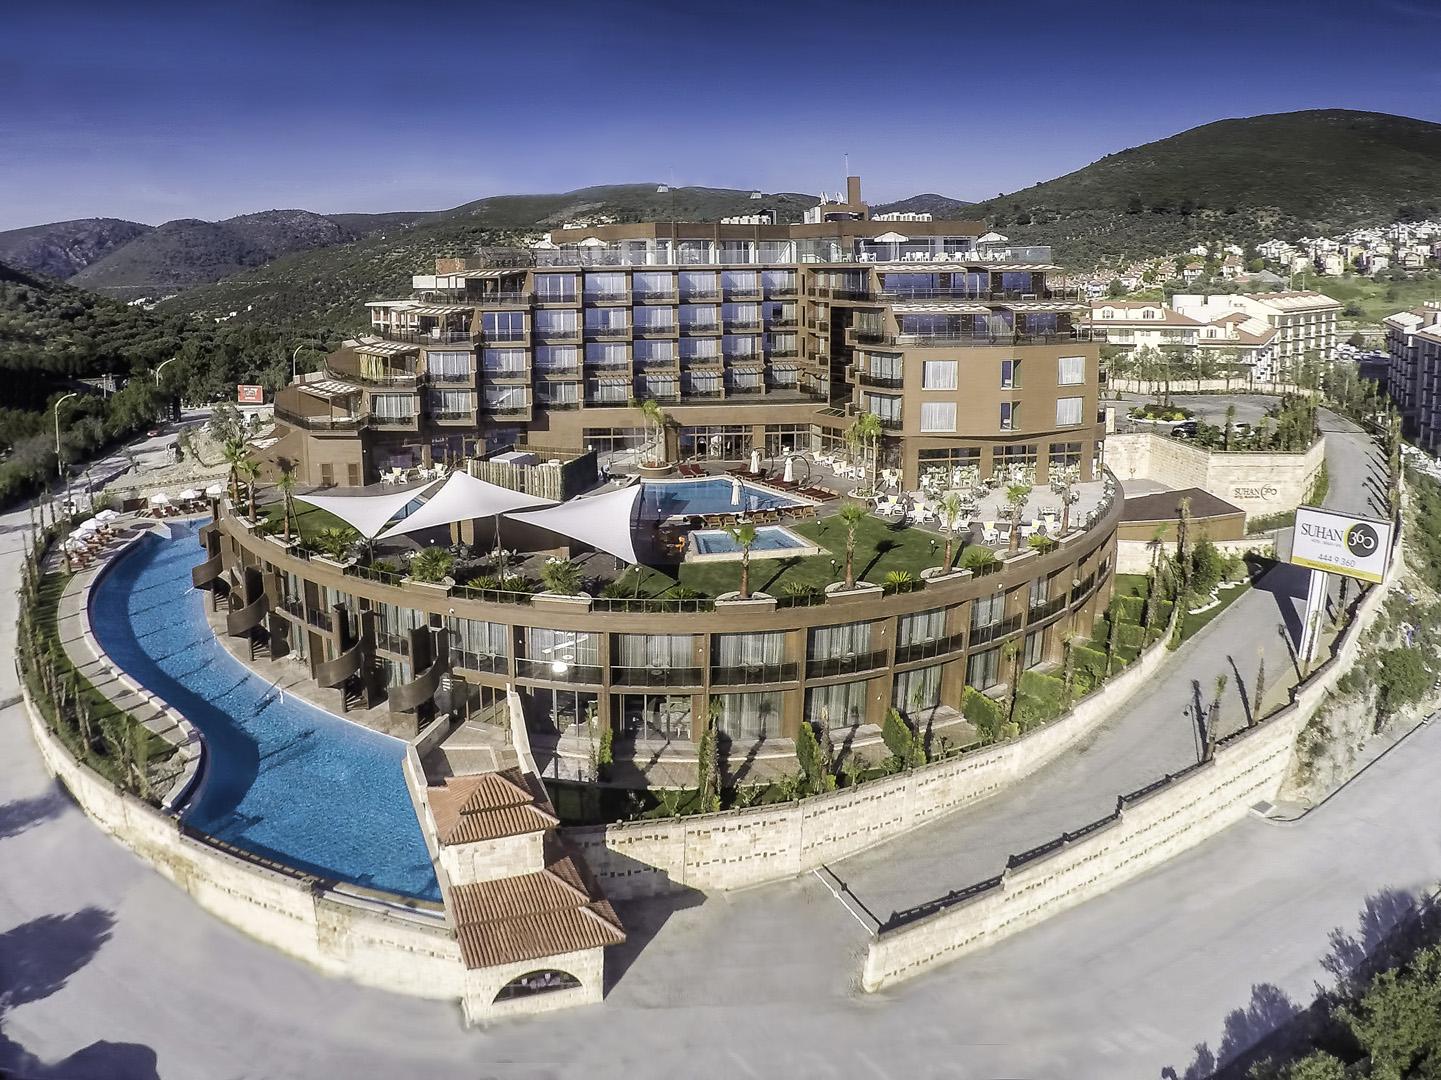 Hotel Suhan 360